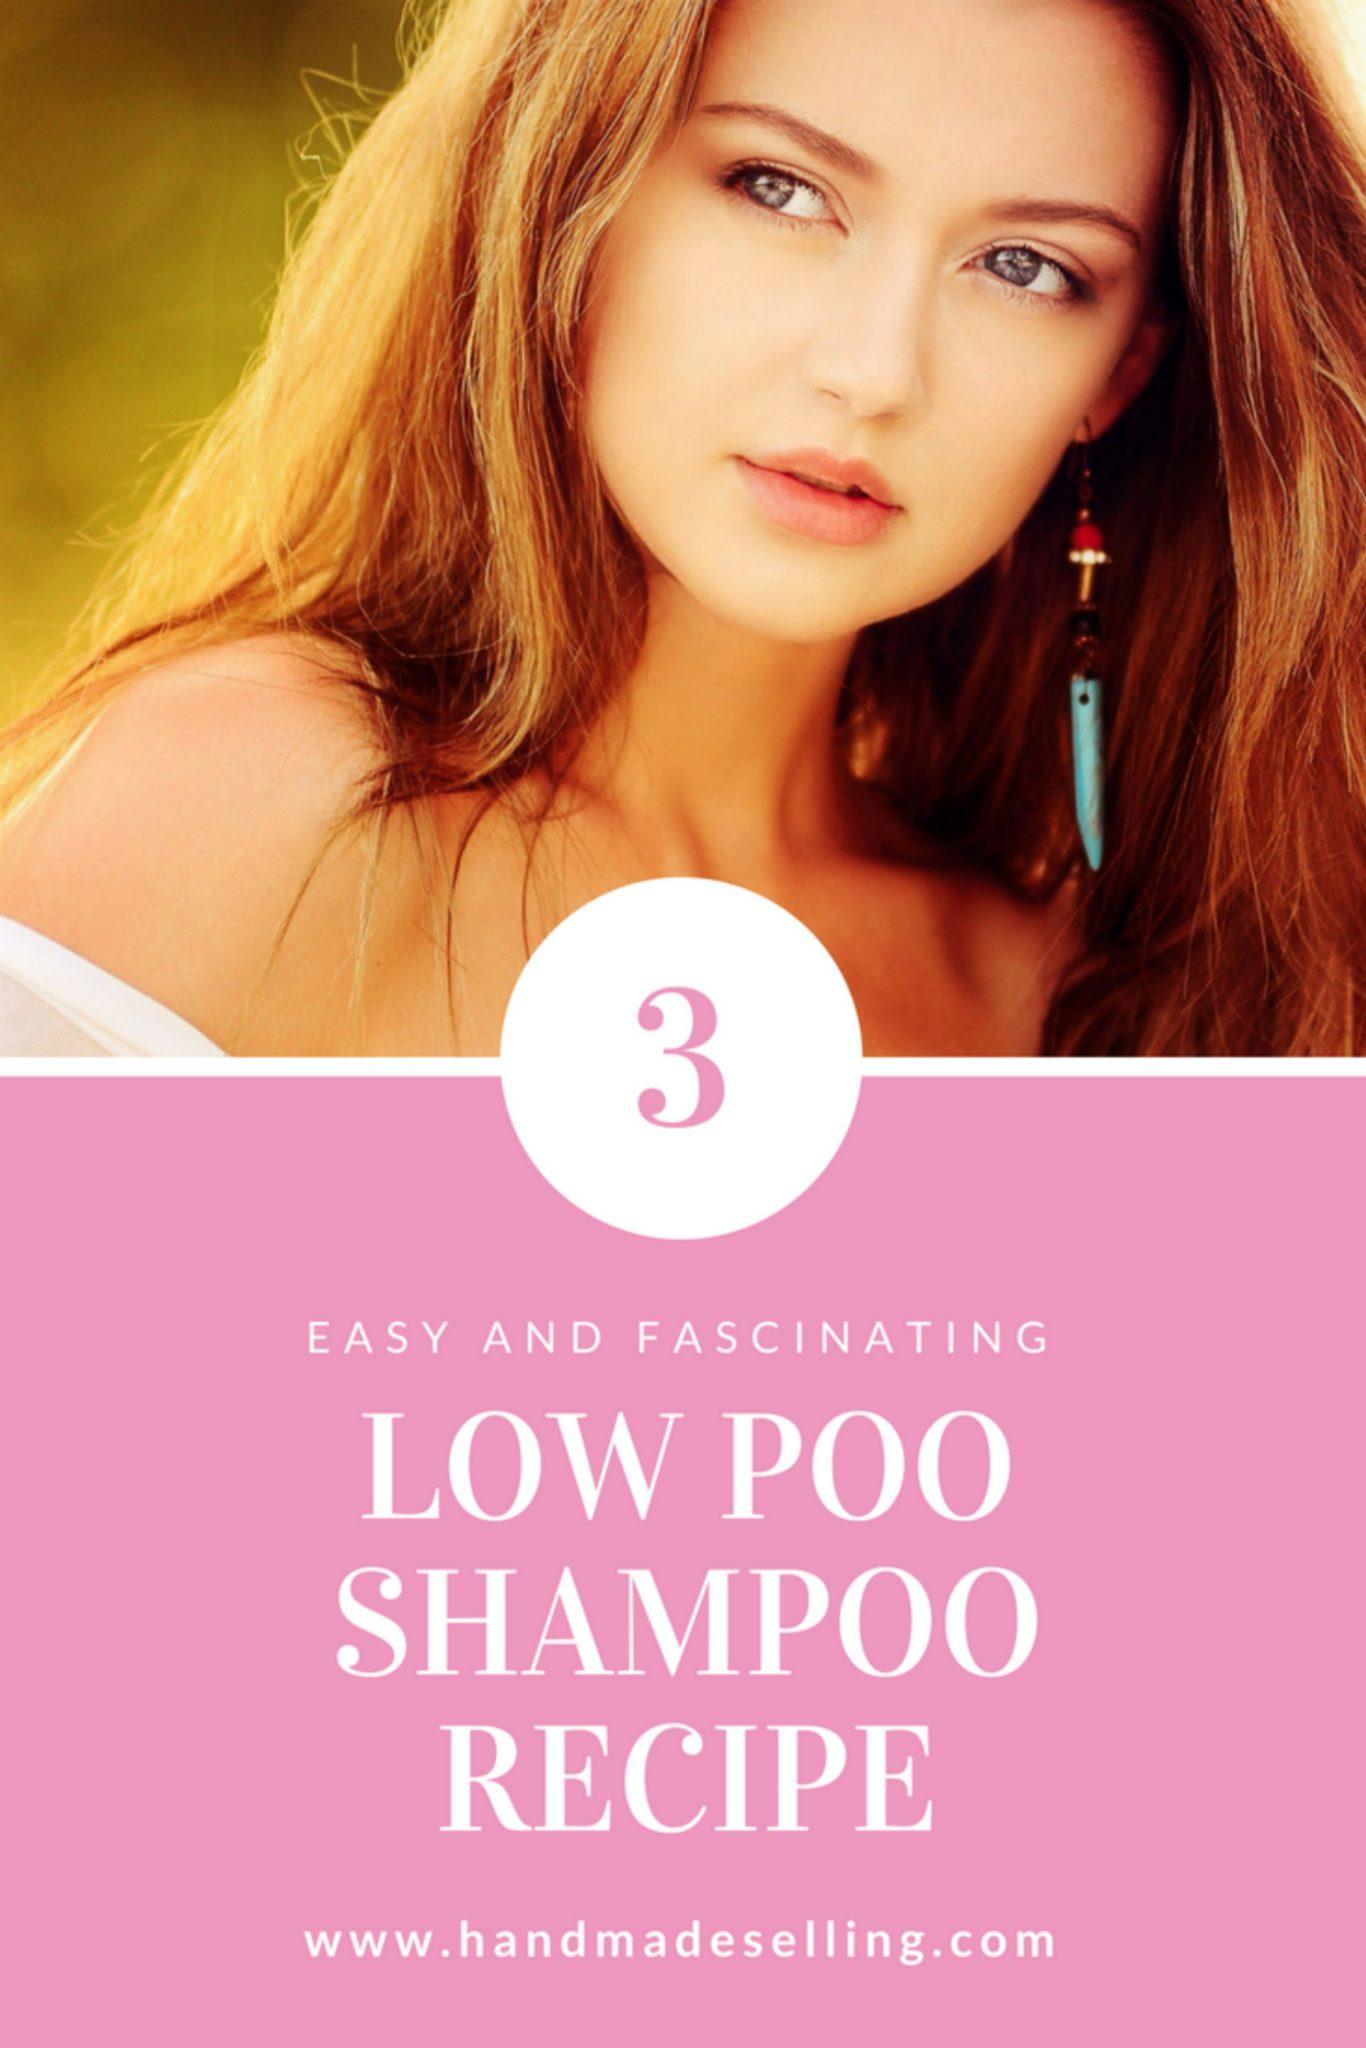 How to Make 3 Low Poo Shampoo Recipe